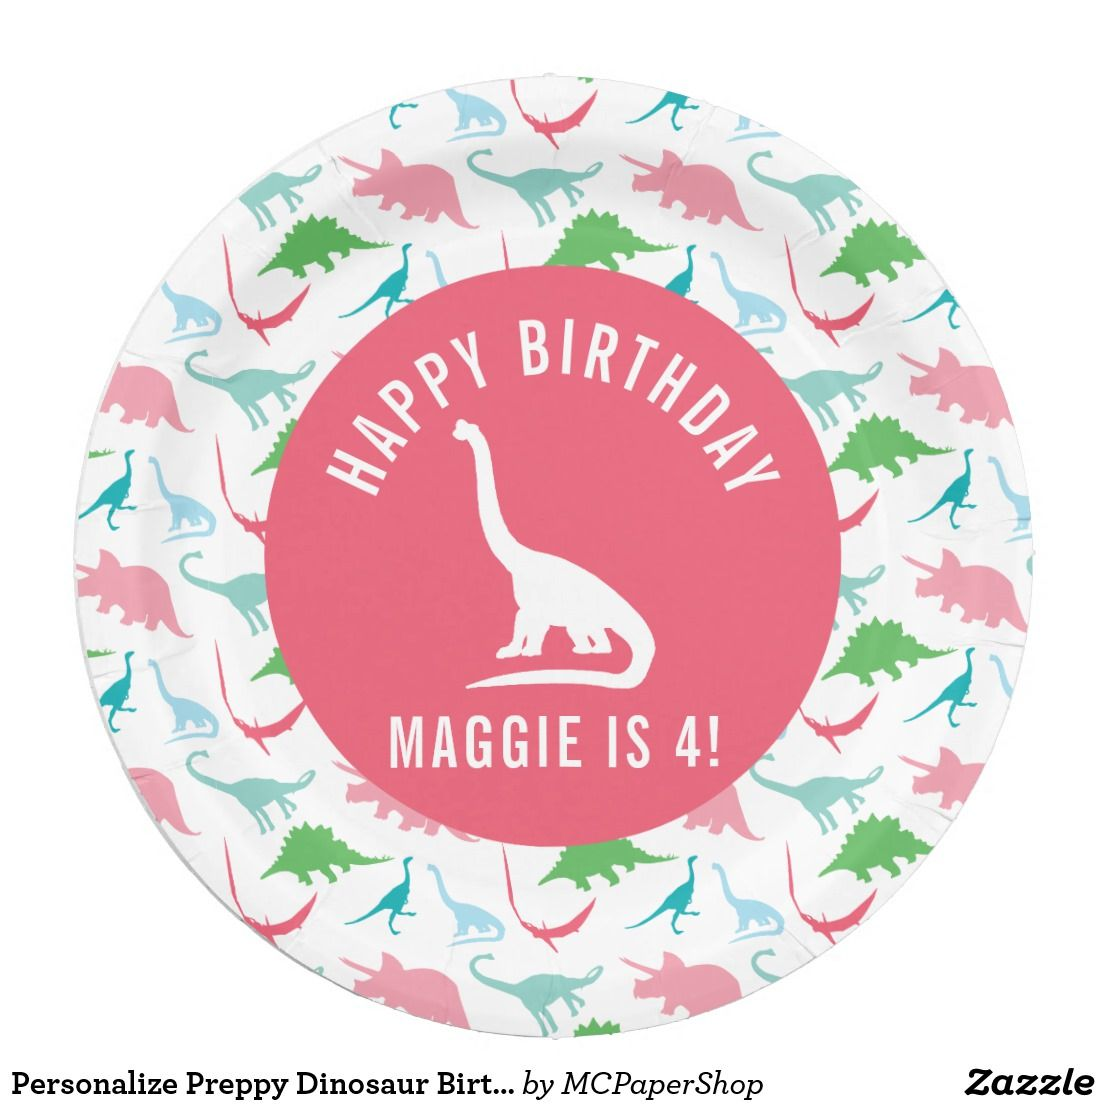 Personalize Preppy Dinosaur Birthday Party Plate Zazzle